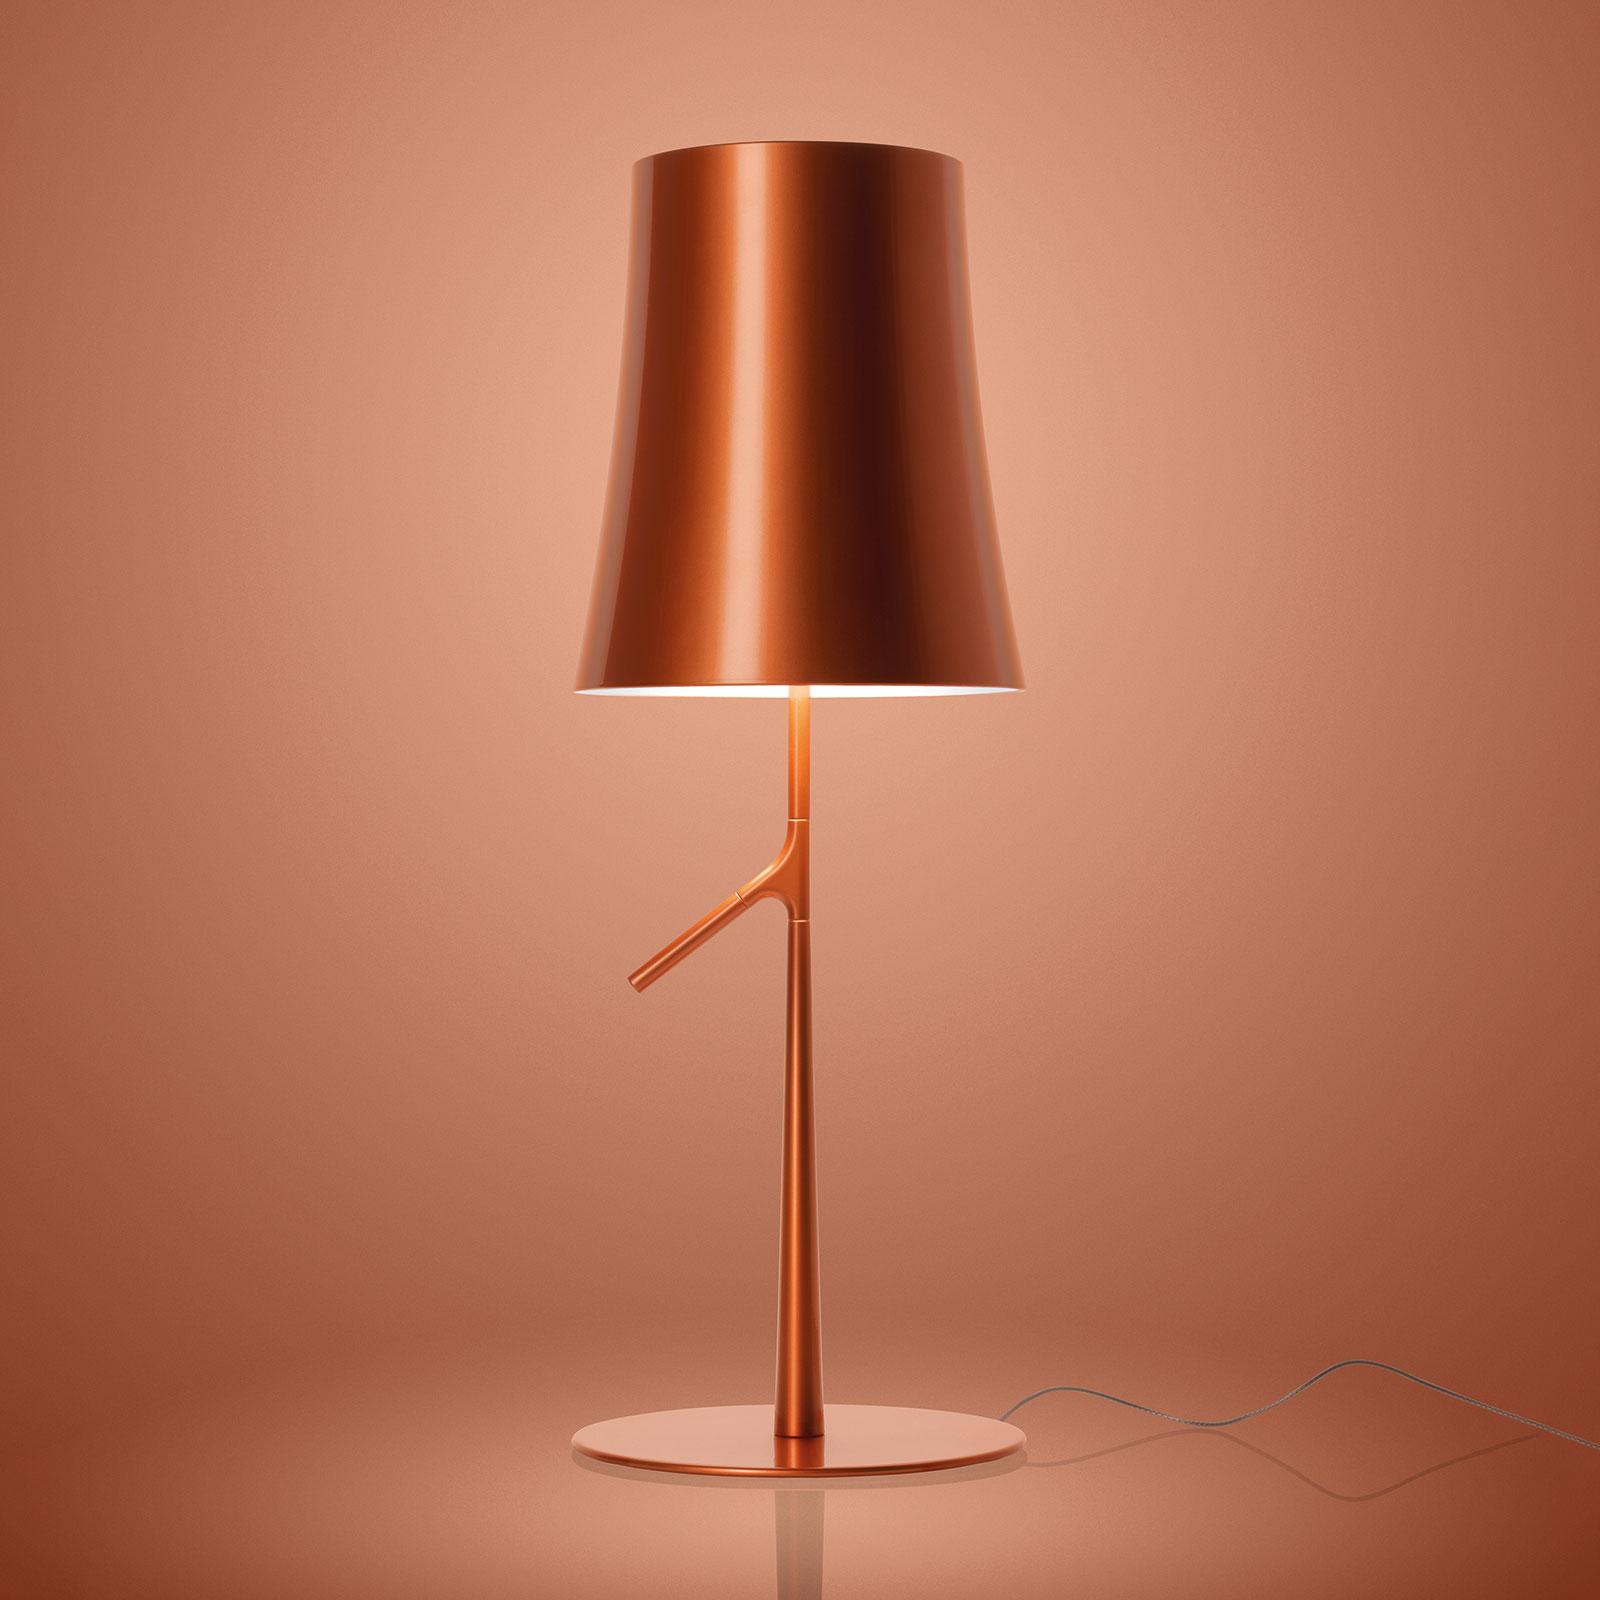 Foscarini Birdie LED piccola lampada, rame